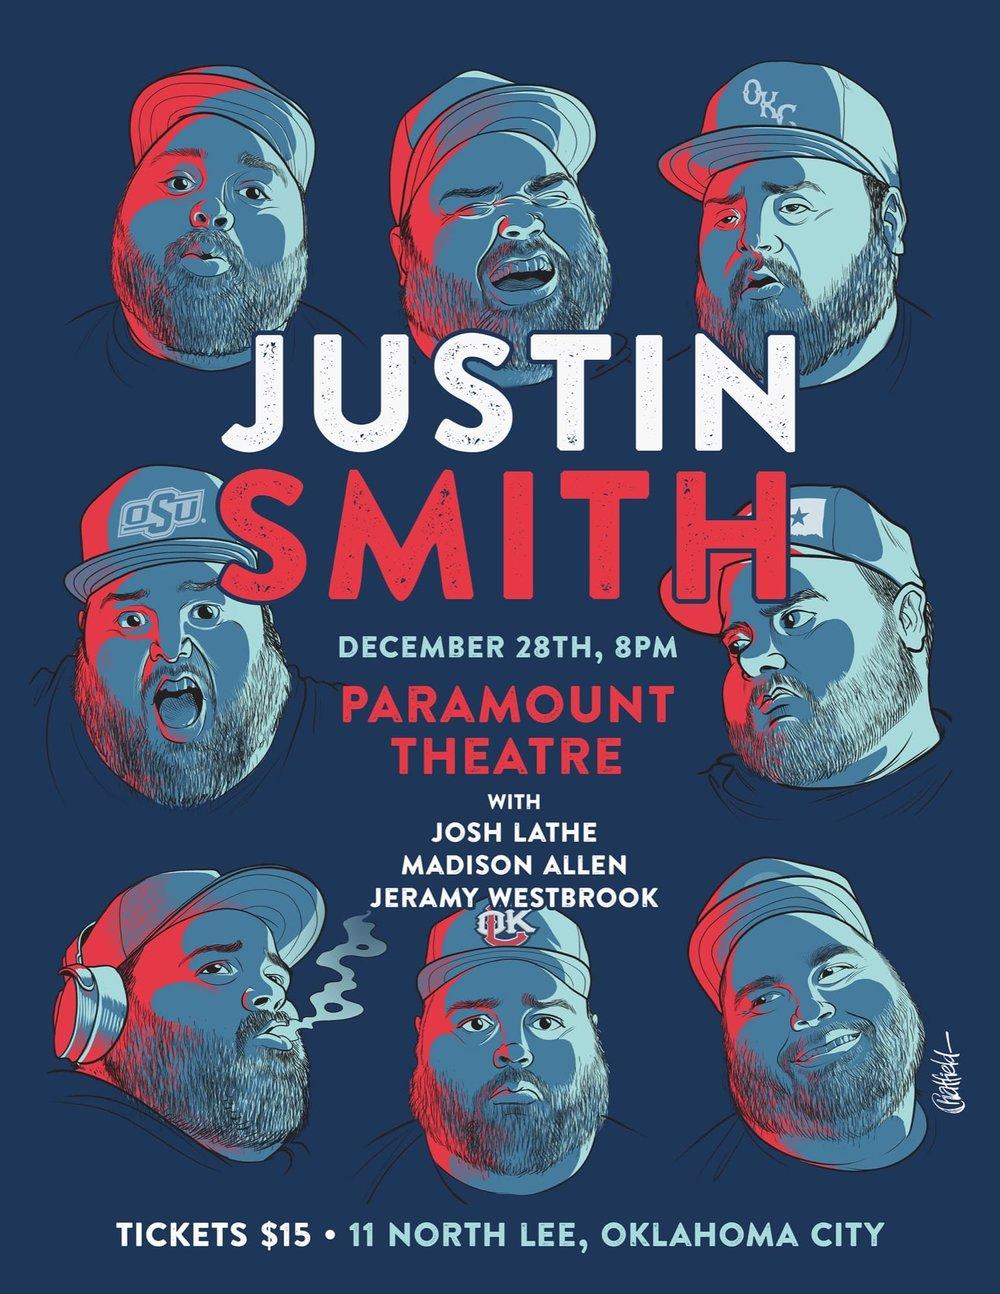 20171116_Justin Smith sml-min.jpg